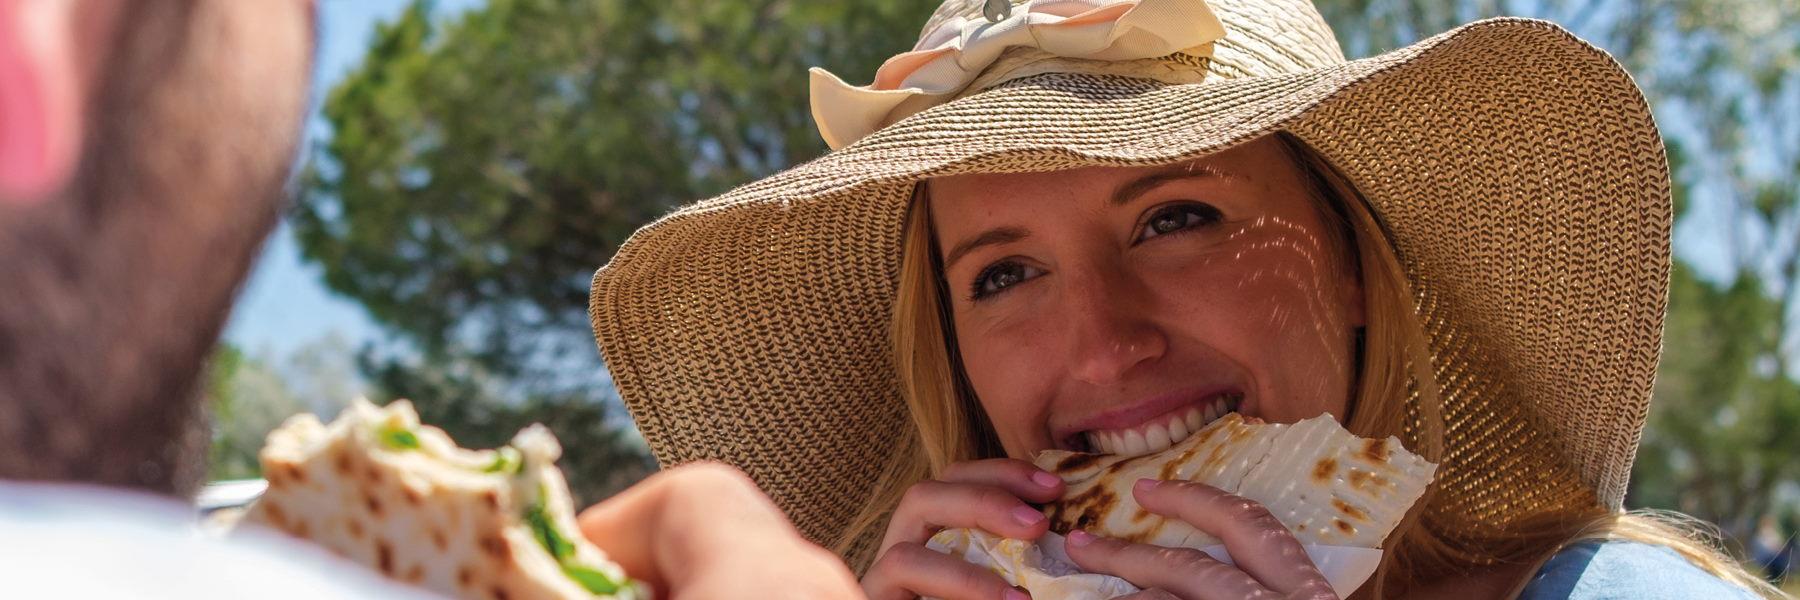 11a - La cucina romagnola